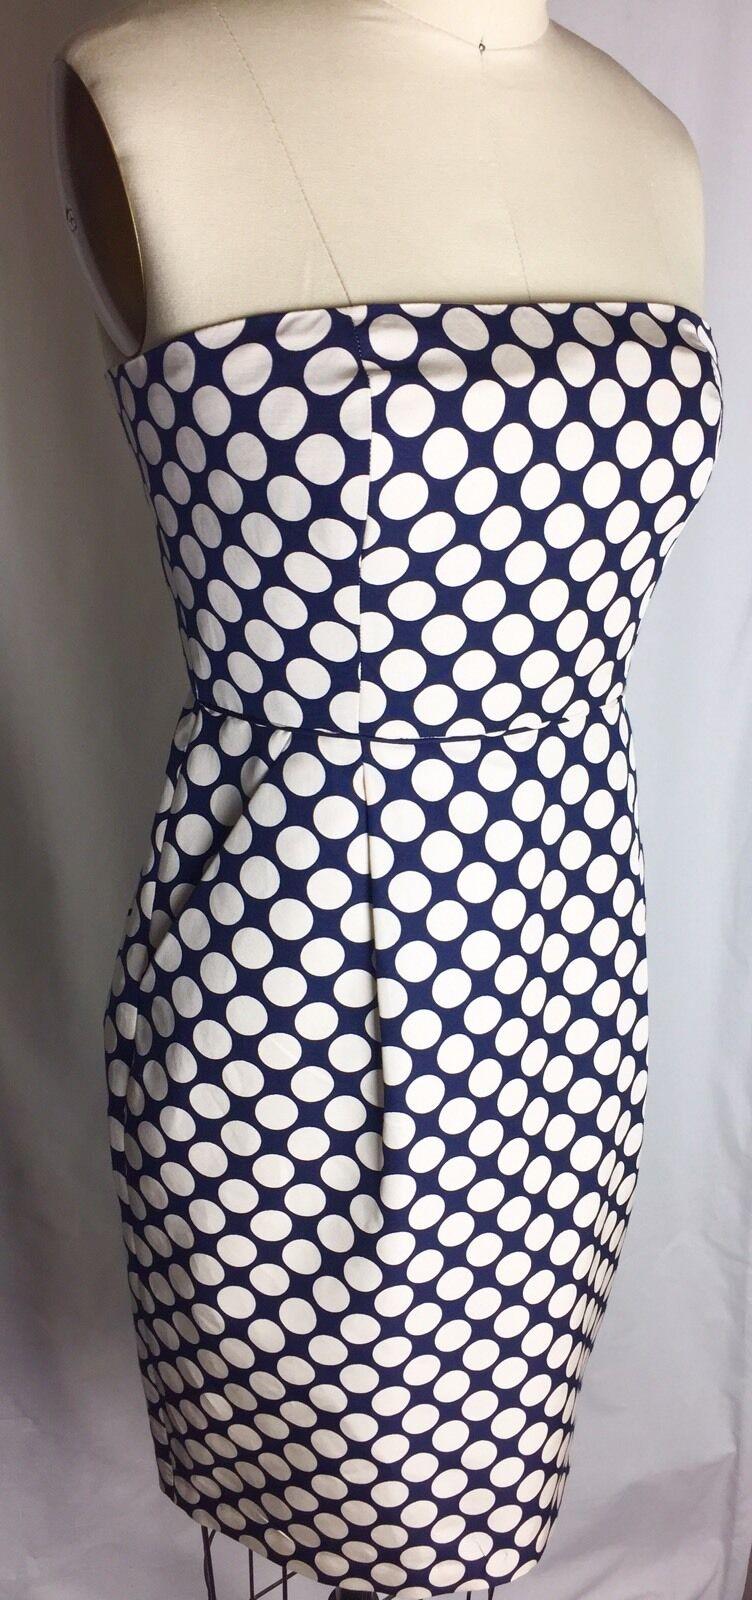 NWT J CREW Silk Cream Navy Polka Dot Strapless Dress Size 4